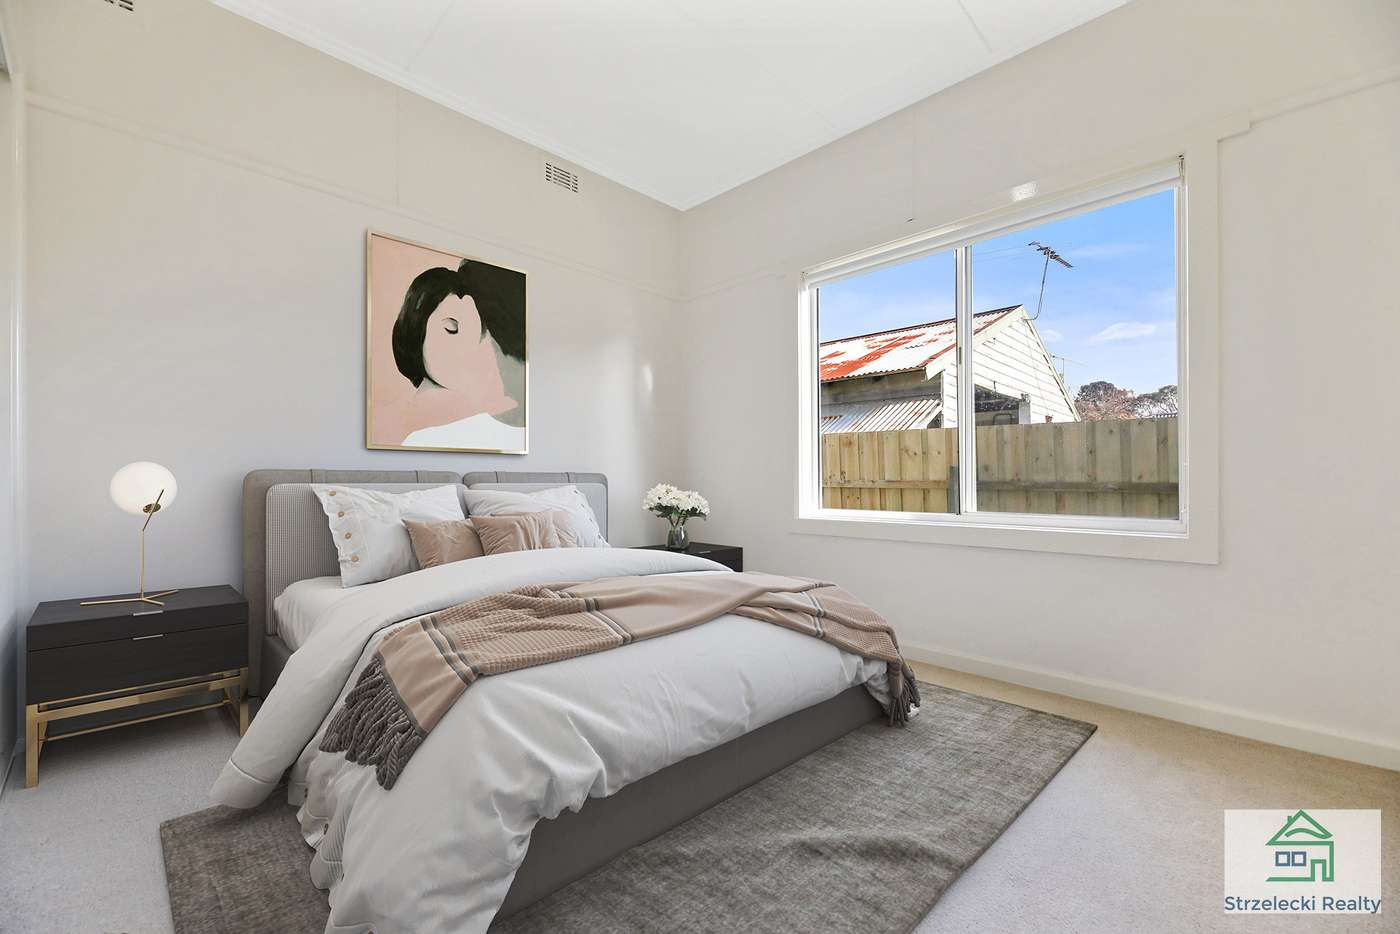 Sixth view of Homely house listing, 1 Brown Street, Trafalgar VIC 3824